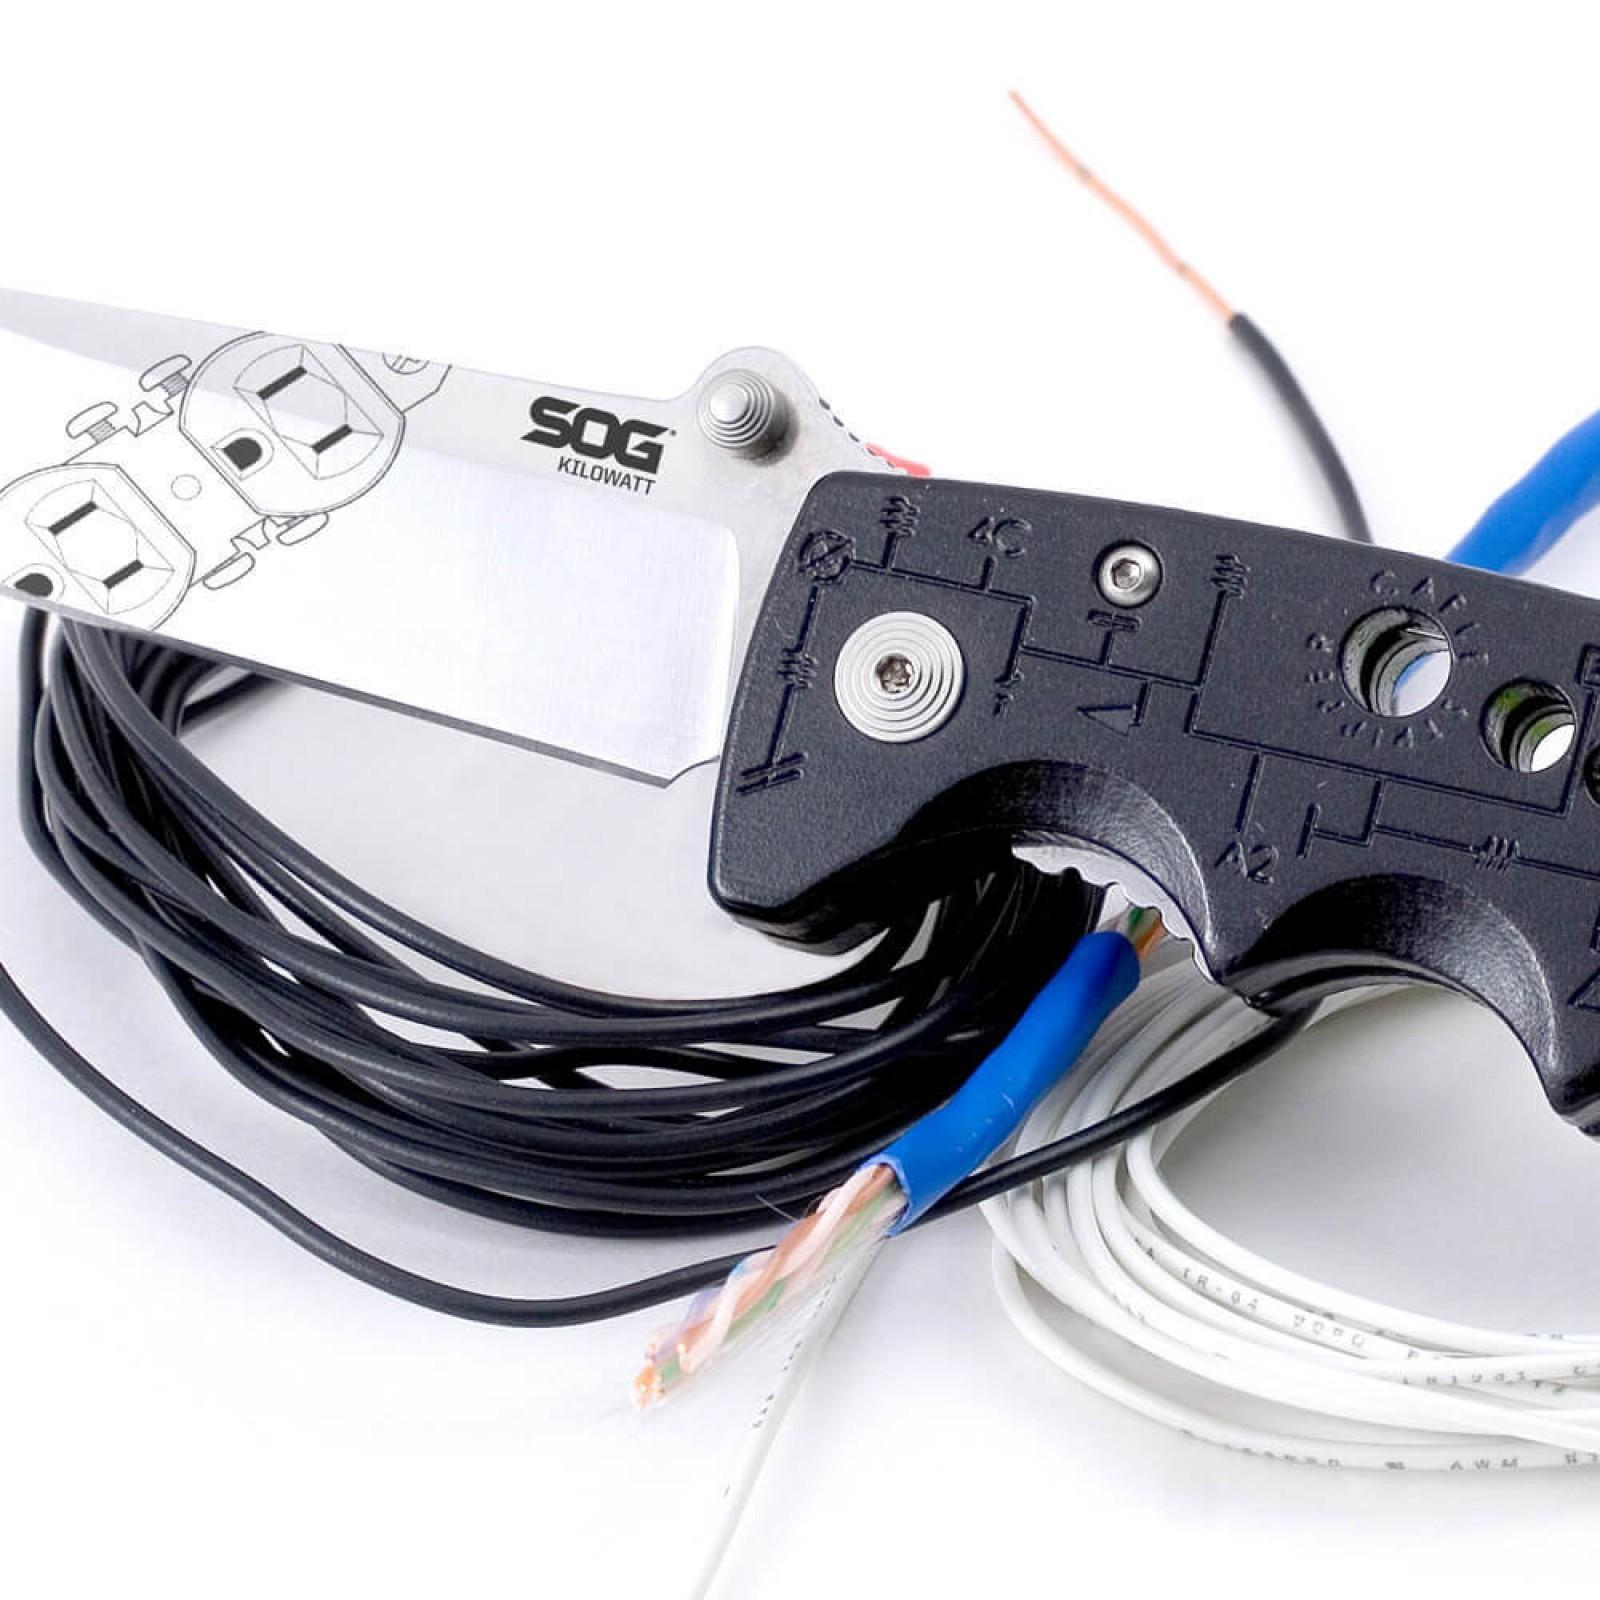 Фото 13 - Складной нож электрика со стриппером Kilowatt - SOG EL01, сталь AUS-8, рукоять термопластик GRN